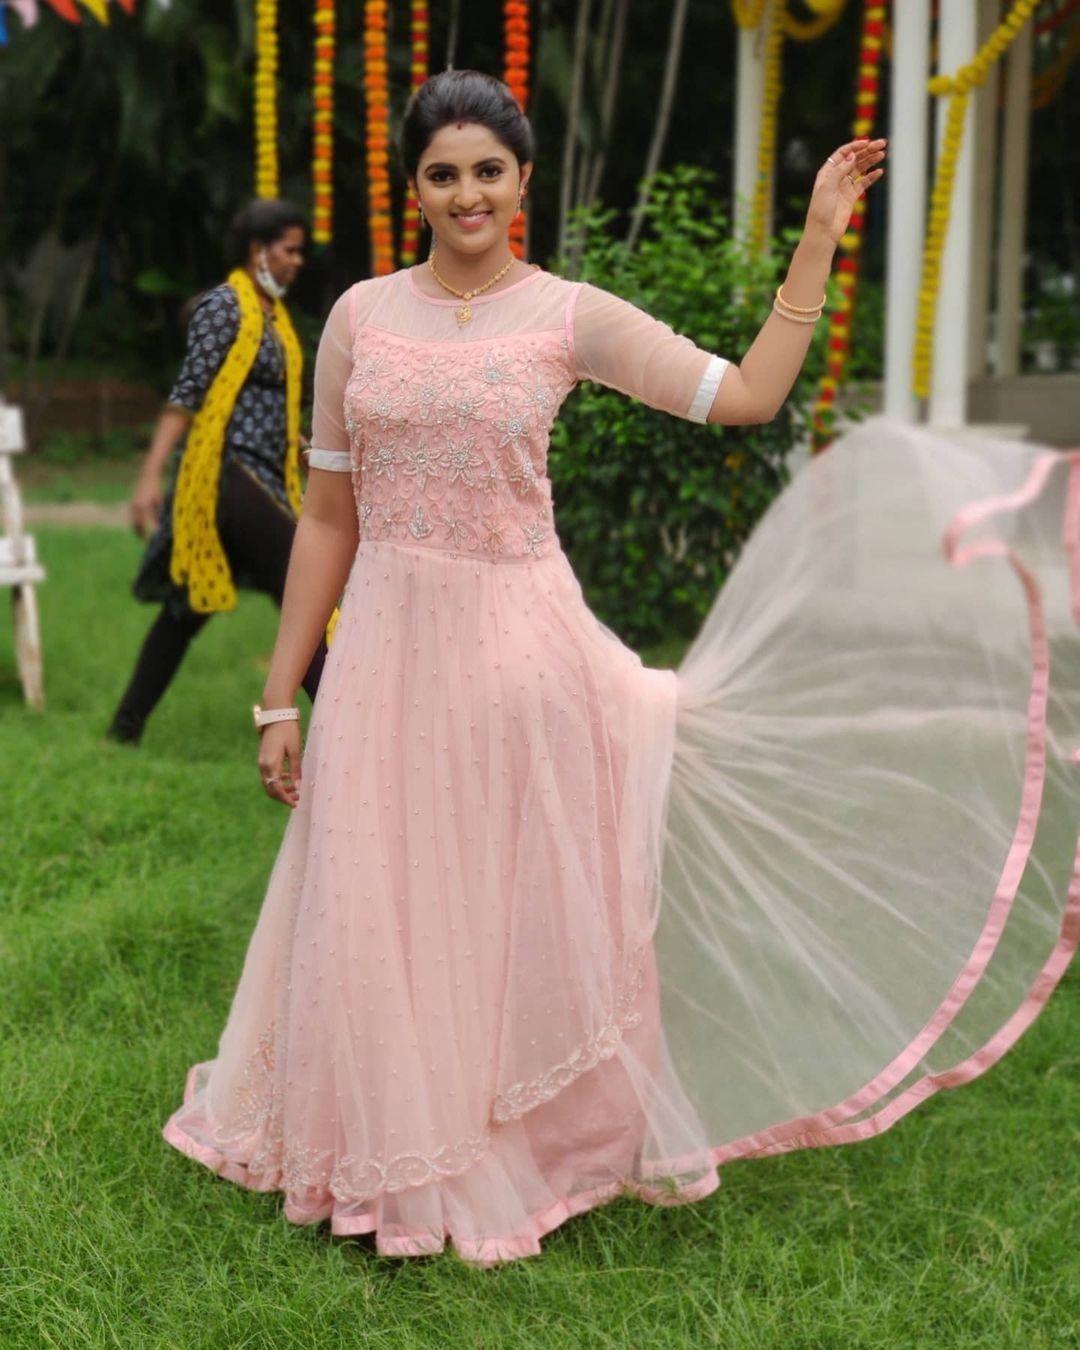 Radhika_Preethi_14655215929_14